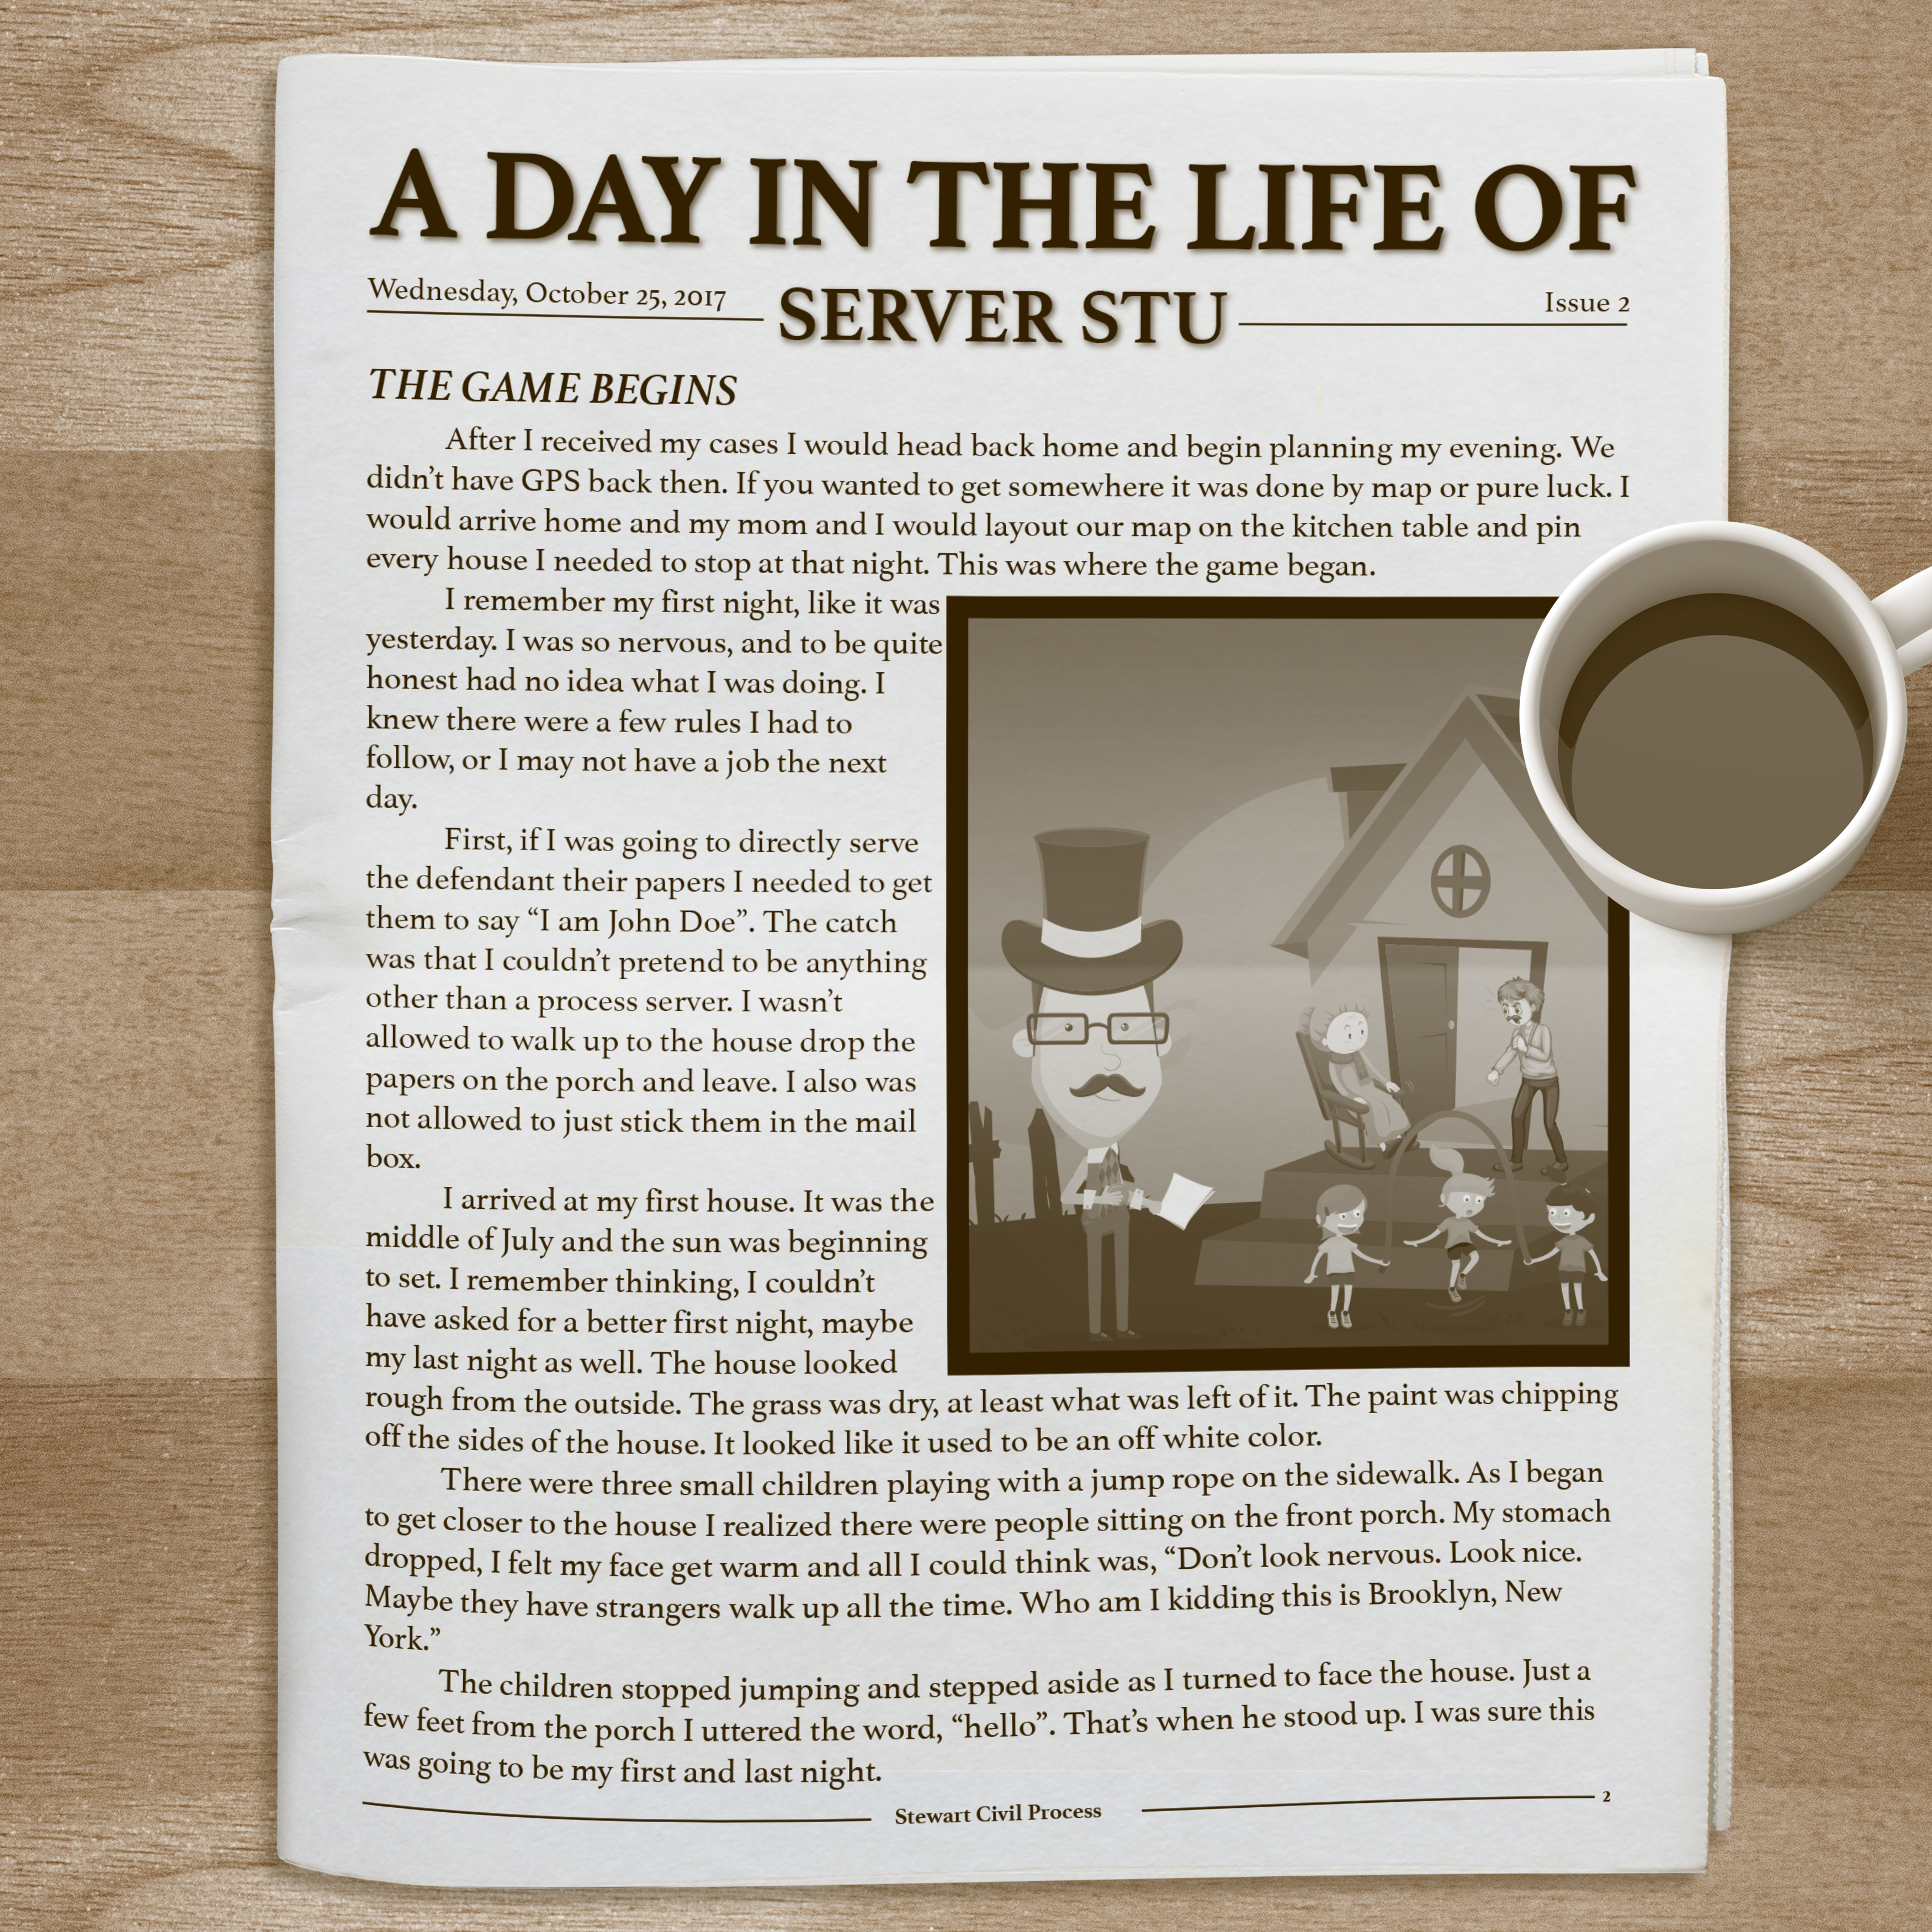 ServerStu_Newspaper-TheGameBegins.jpg